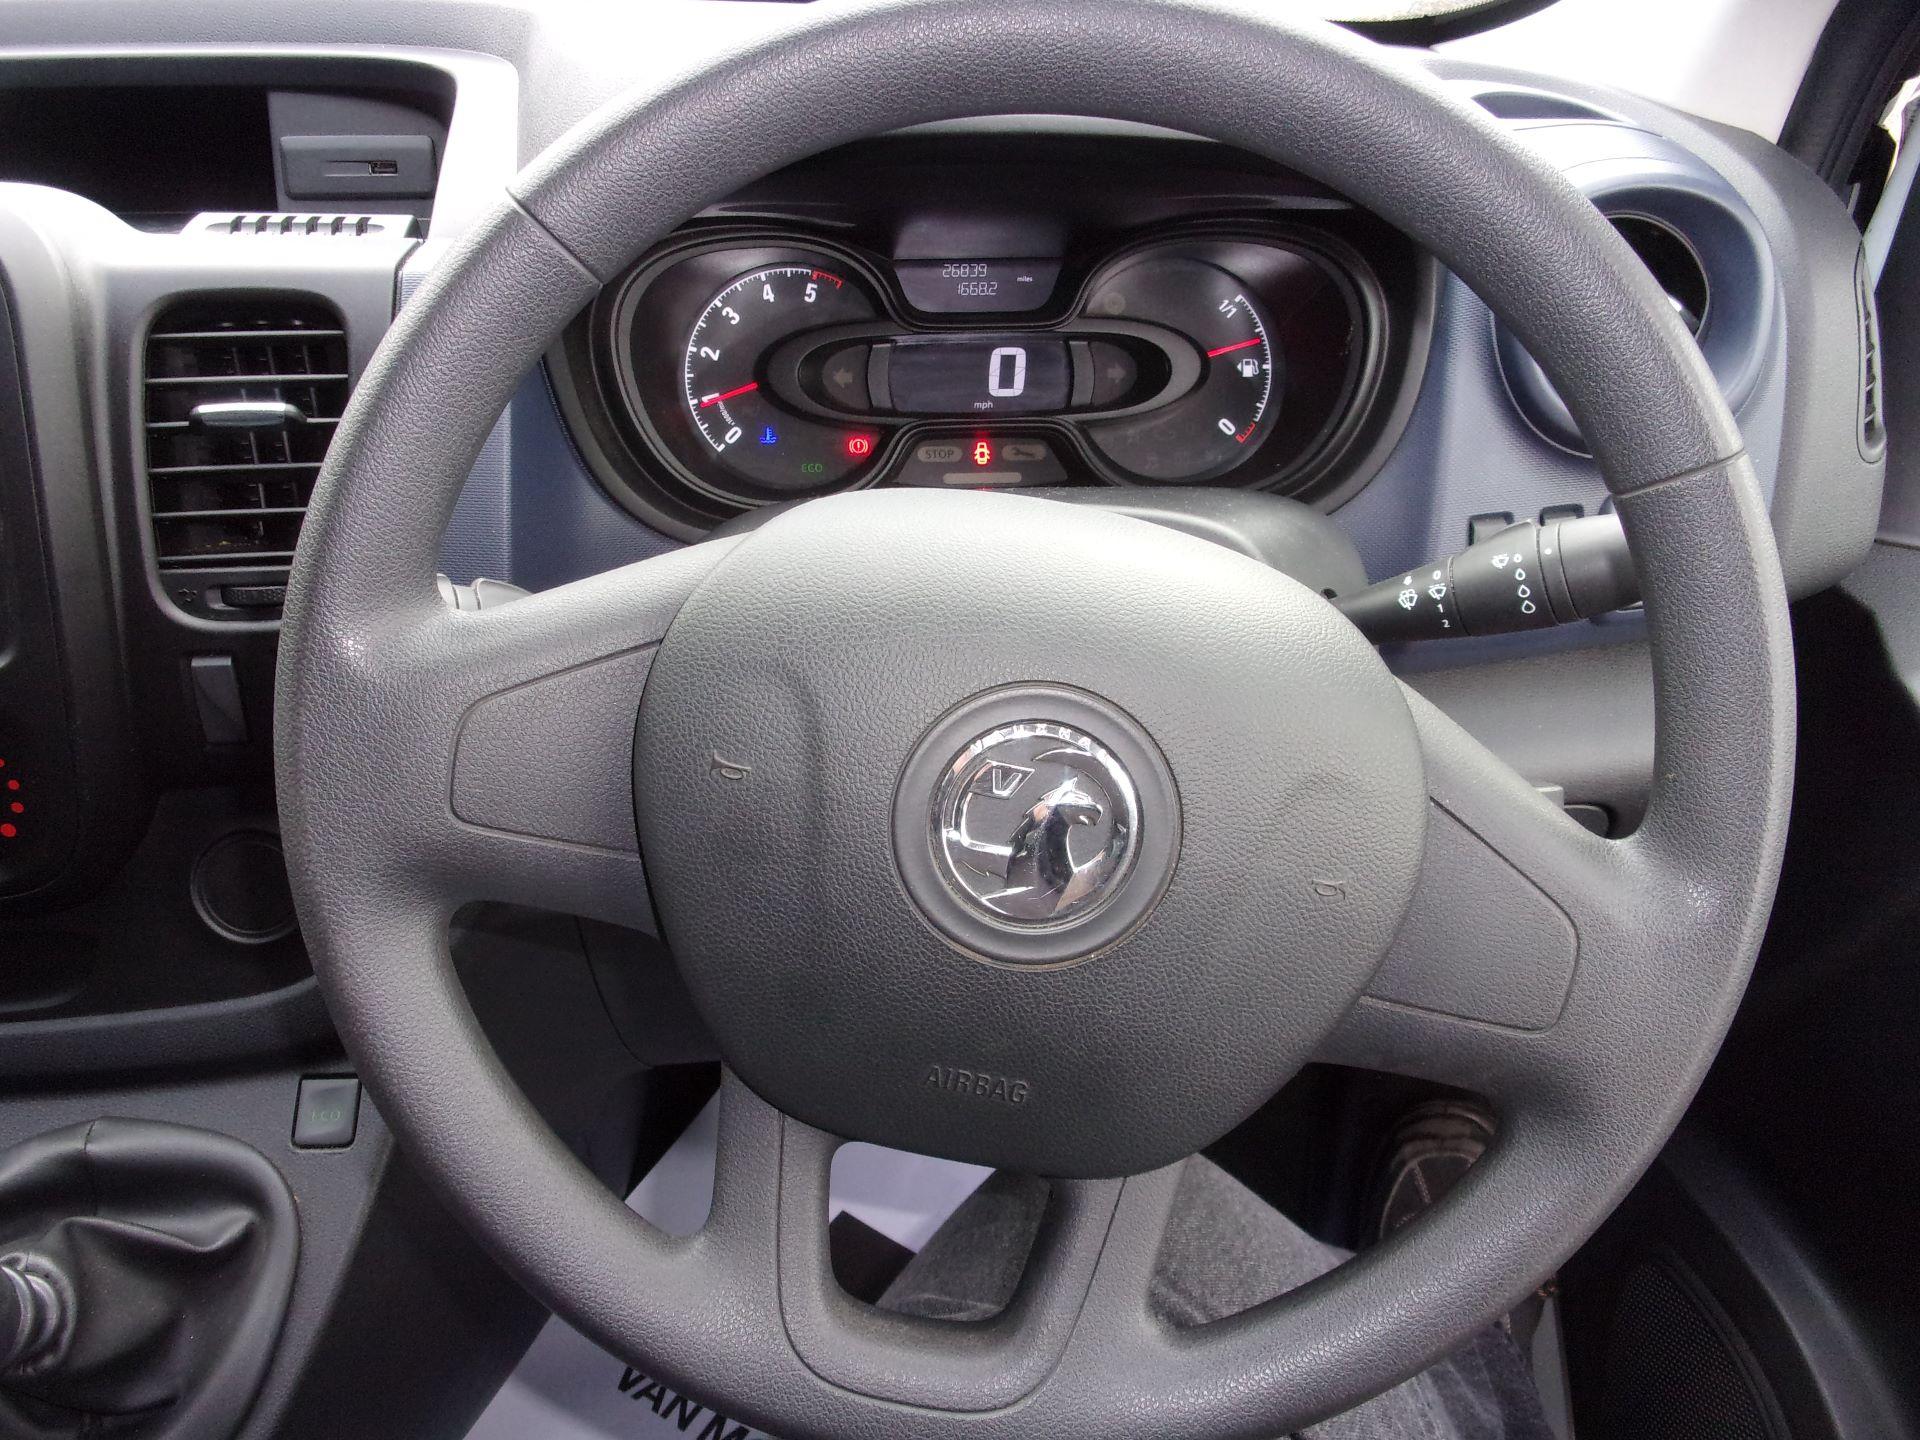 2017 Vauxhall Vivaro L2 H1 2900 1.6 CDTI 120PS EURO 6 (DY67DWG) Image 5